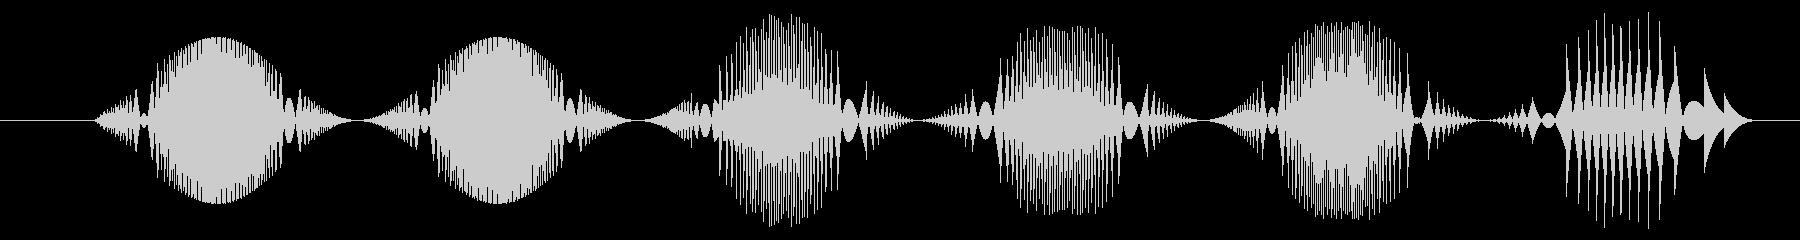 FX アーケードゲーム01の未再生の波形